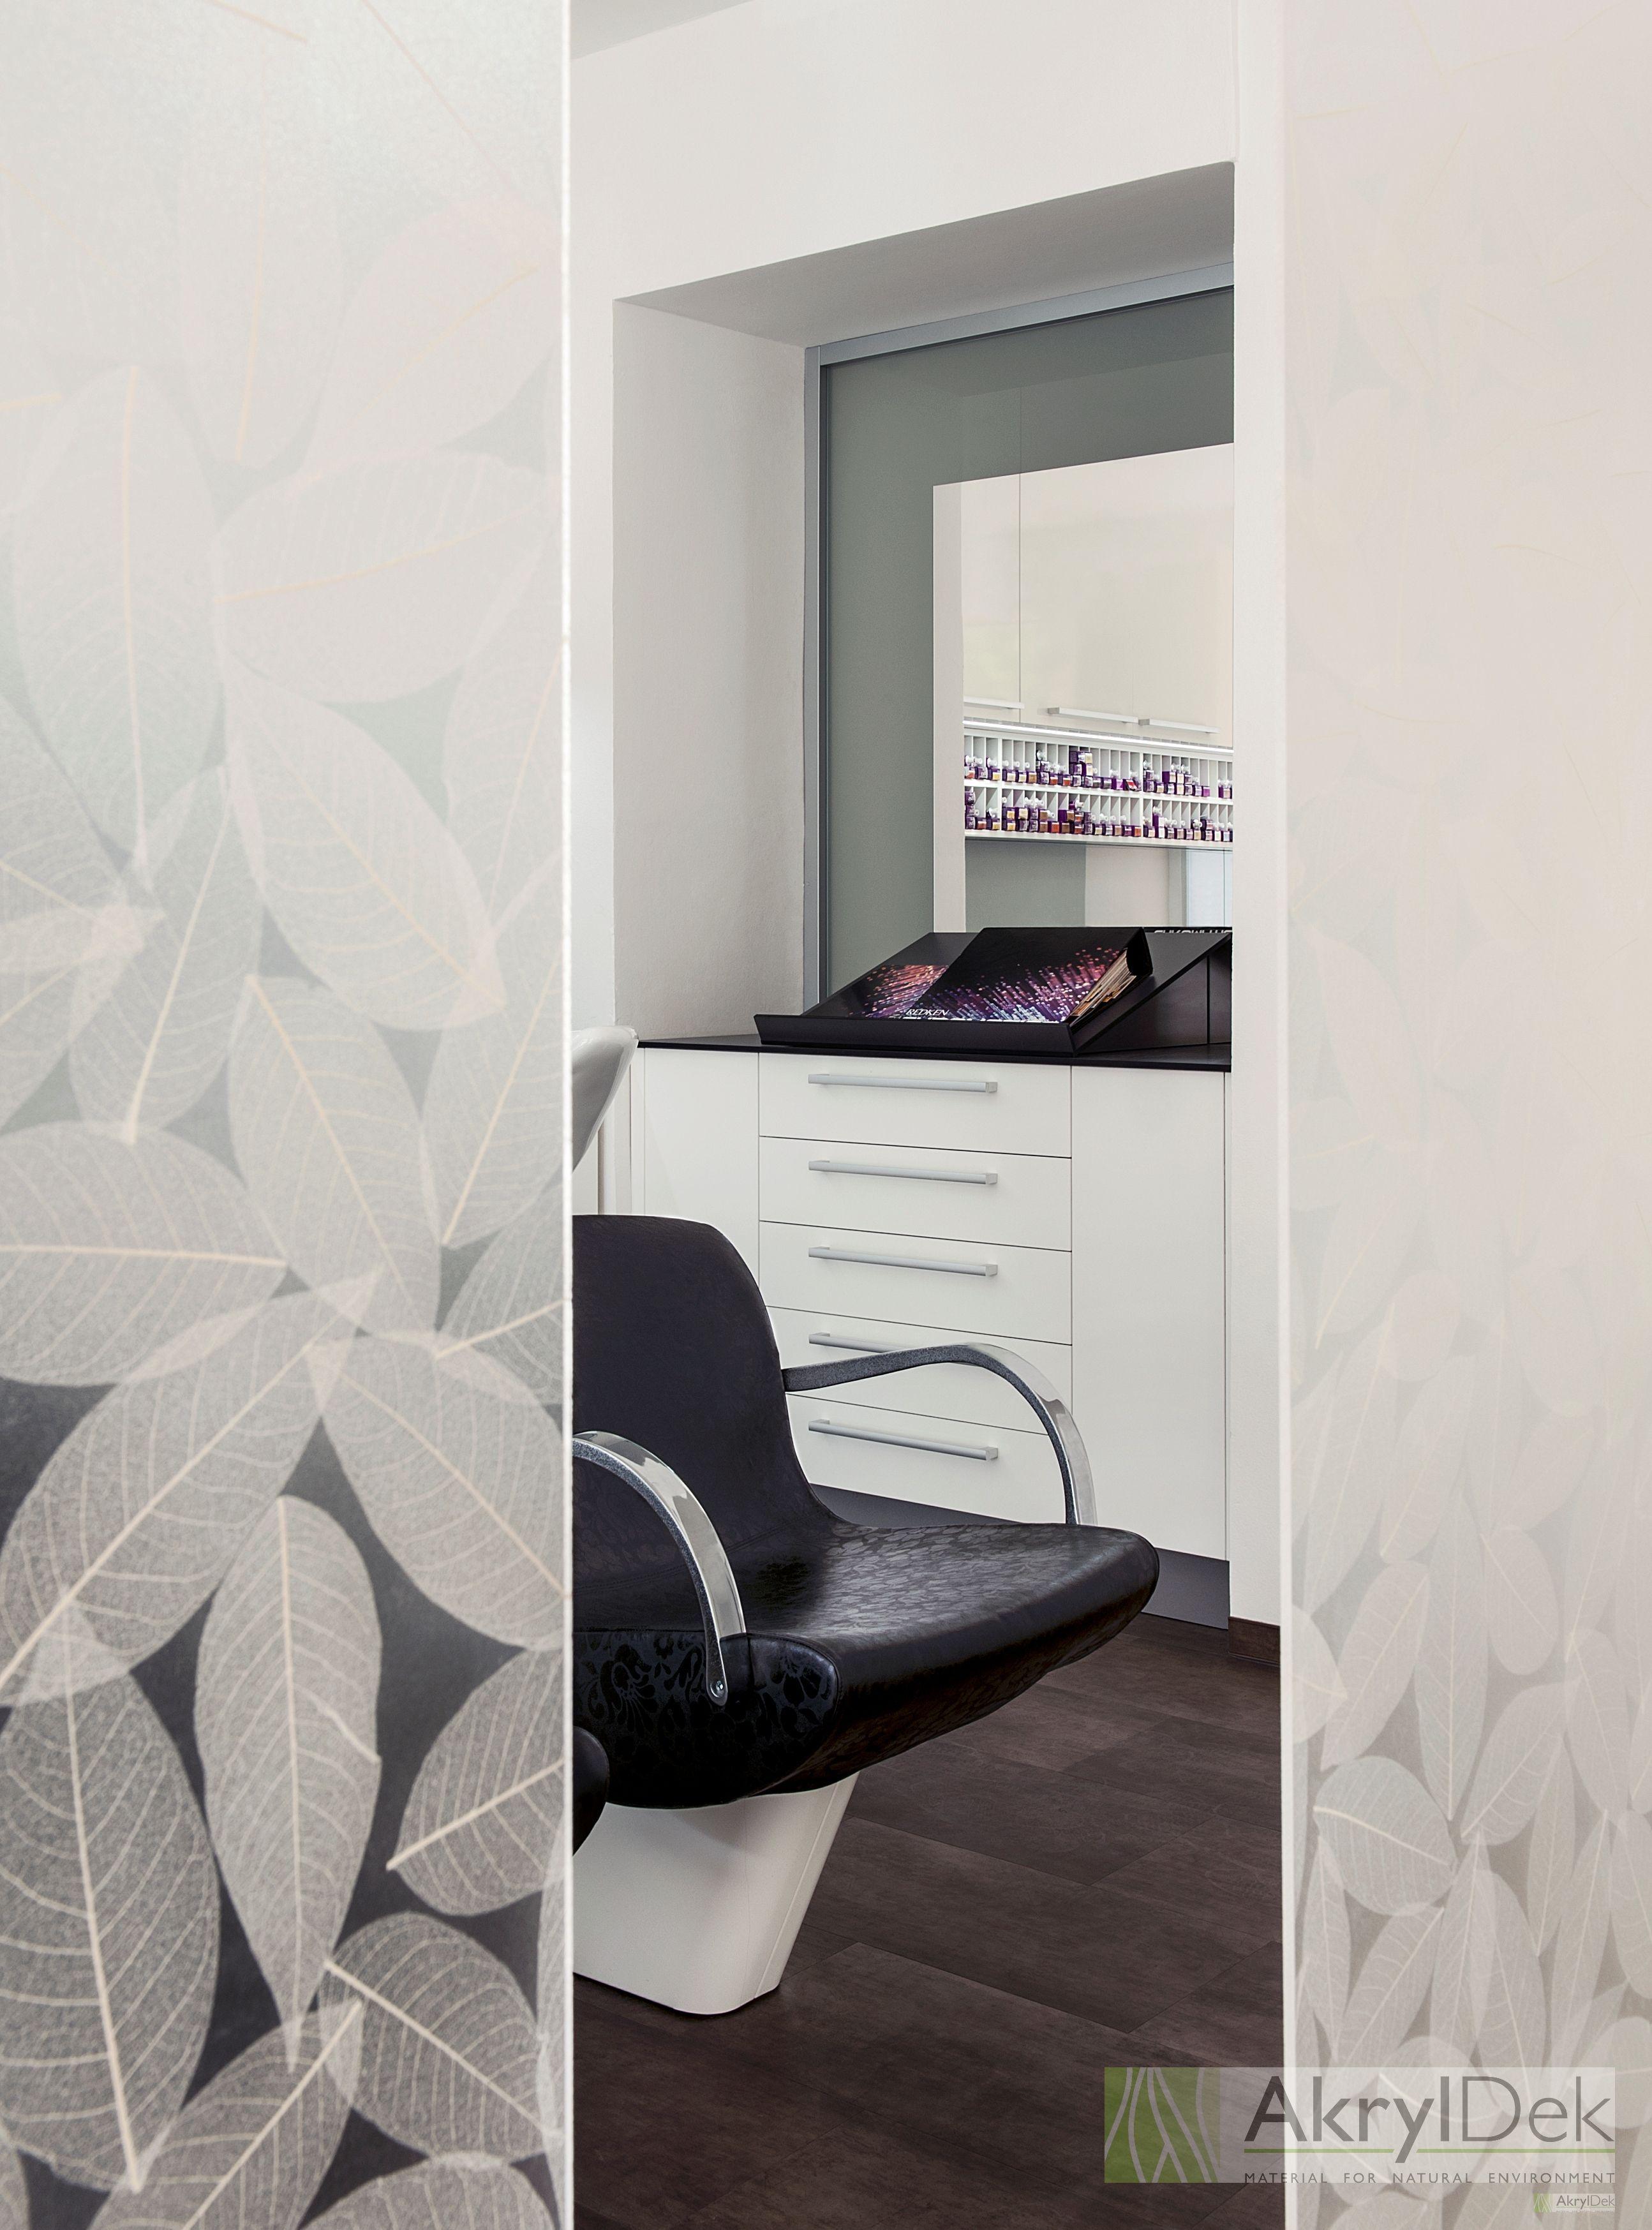 Hairdressing Saloon Designed By Resin Panel With Organic Leaves Resin Panel Plexiglass Acrylic Translucent Ecoresin Panels Organics Wall Decoration I